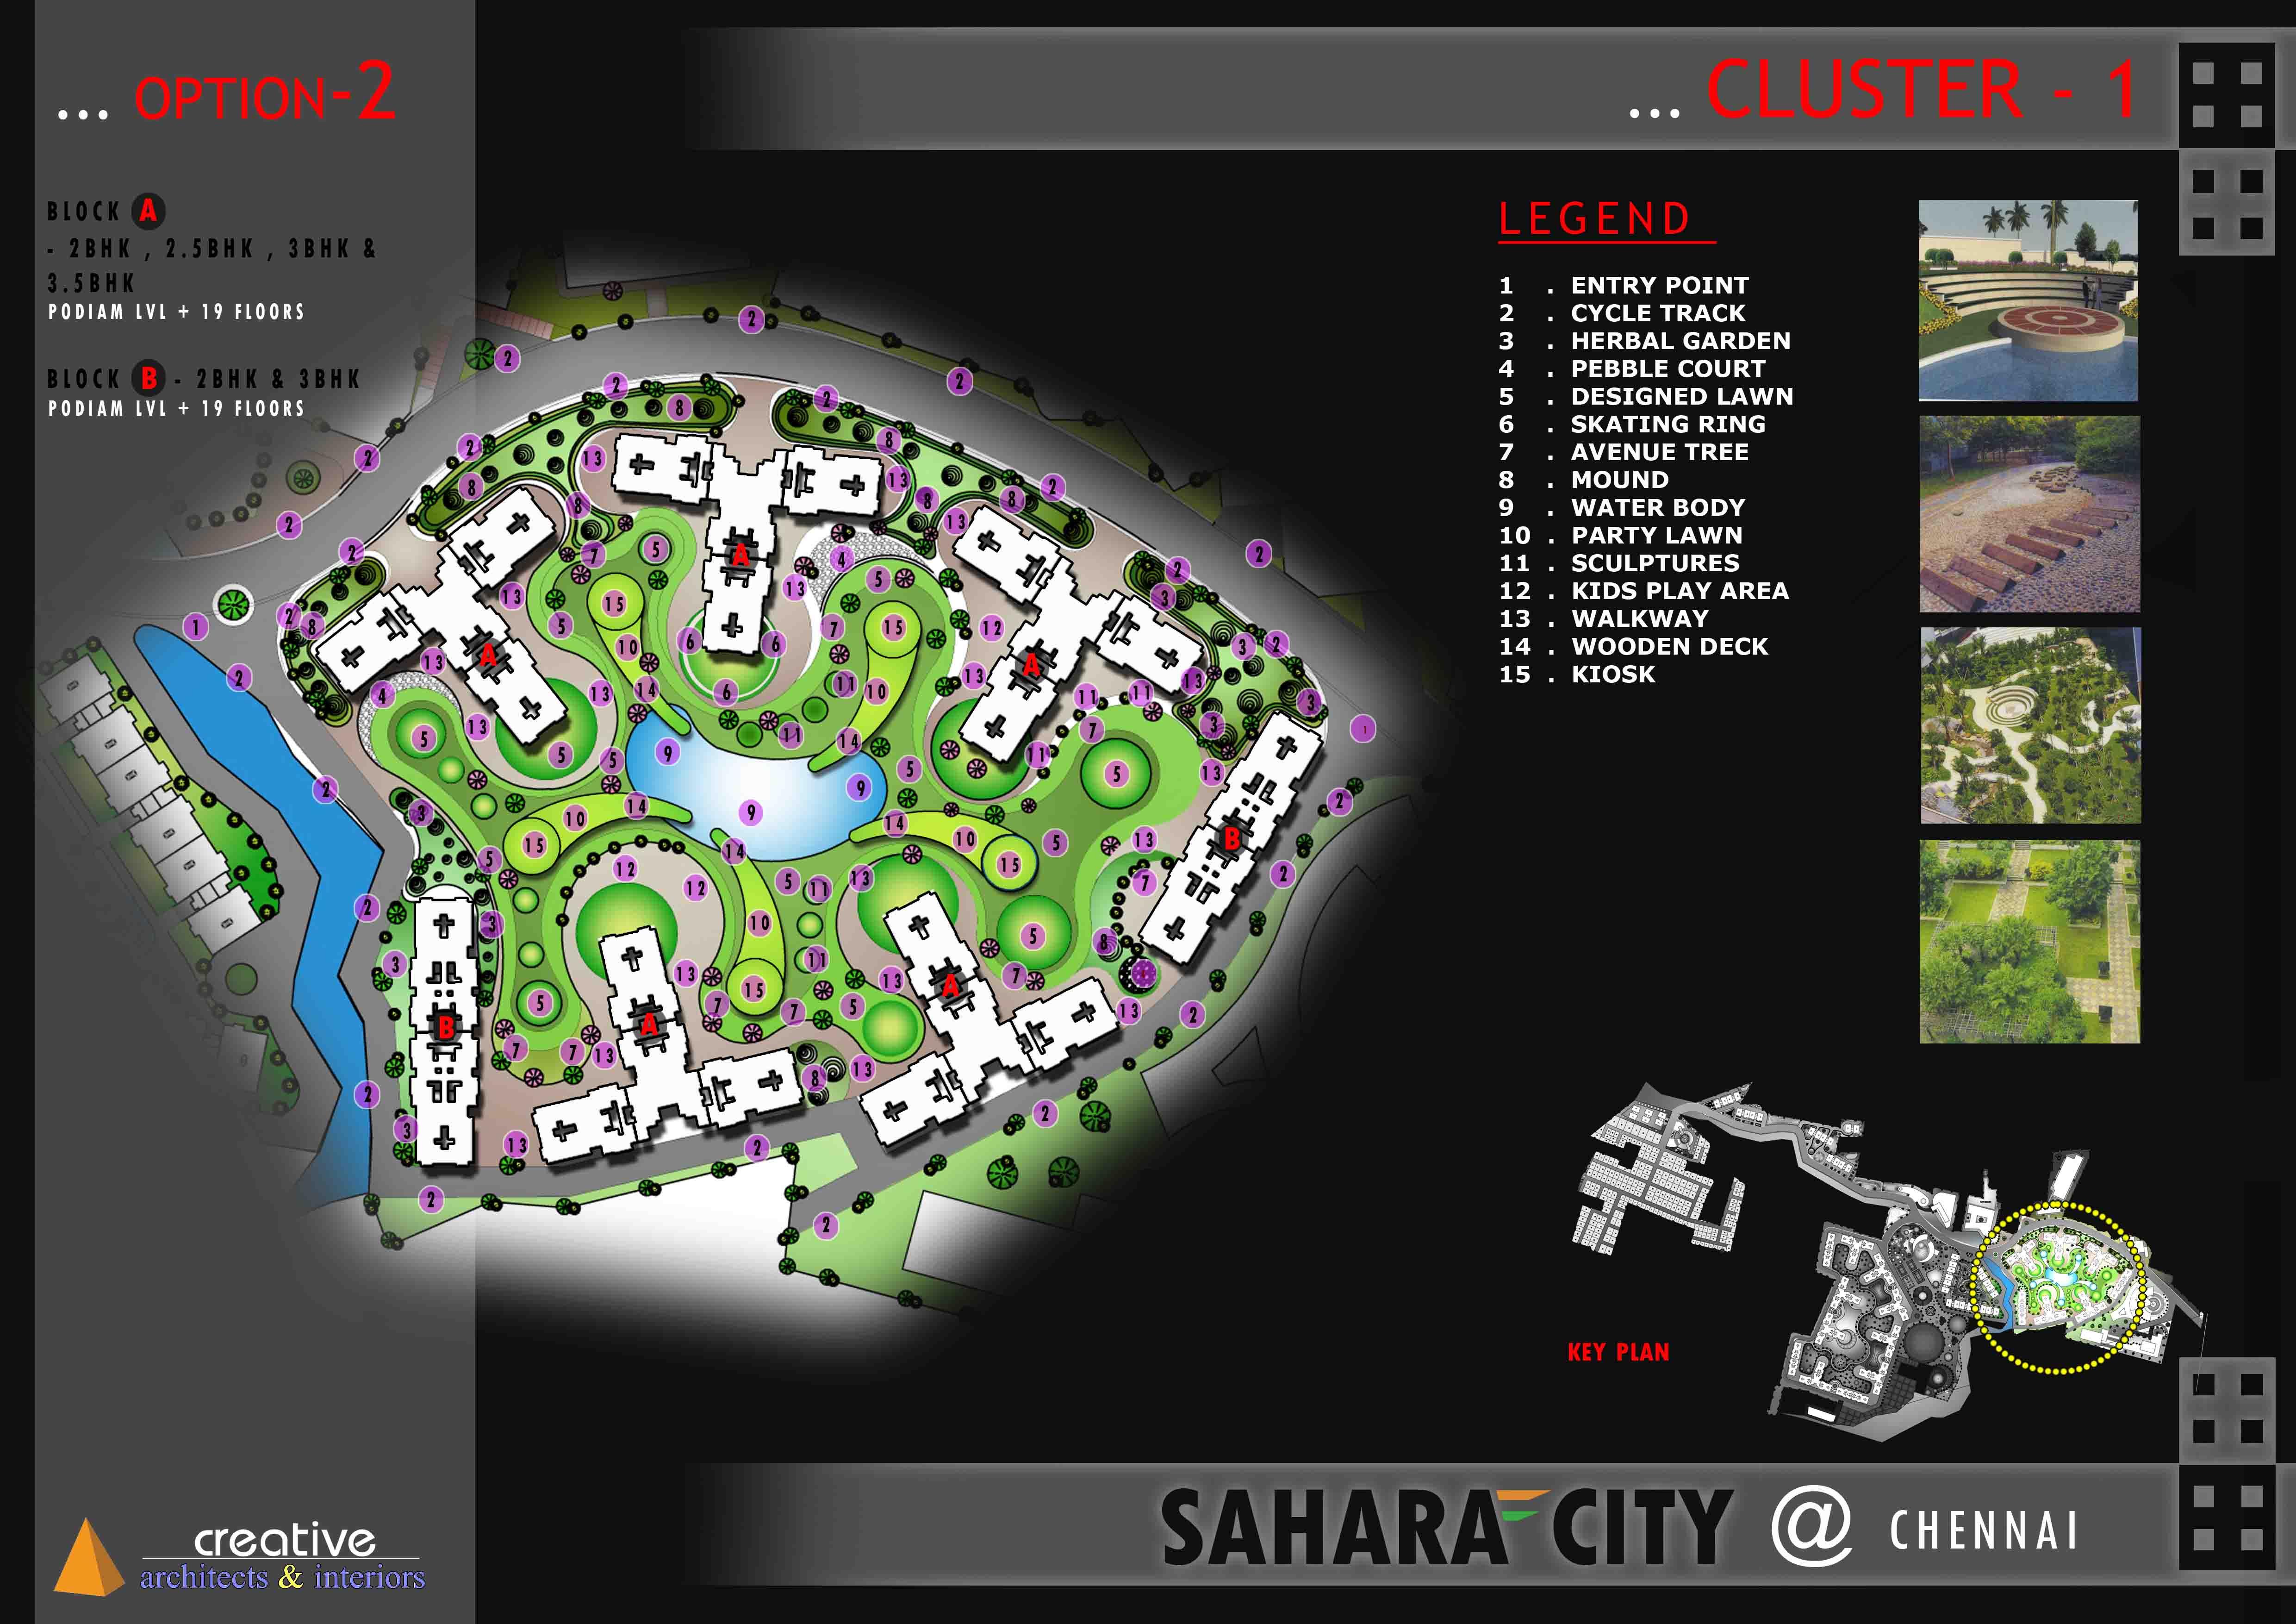 Masterplanning-Sahara City-Chennai